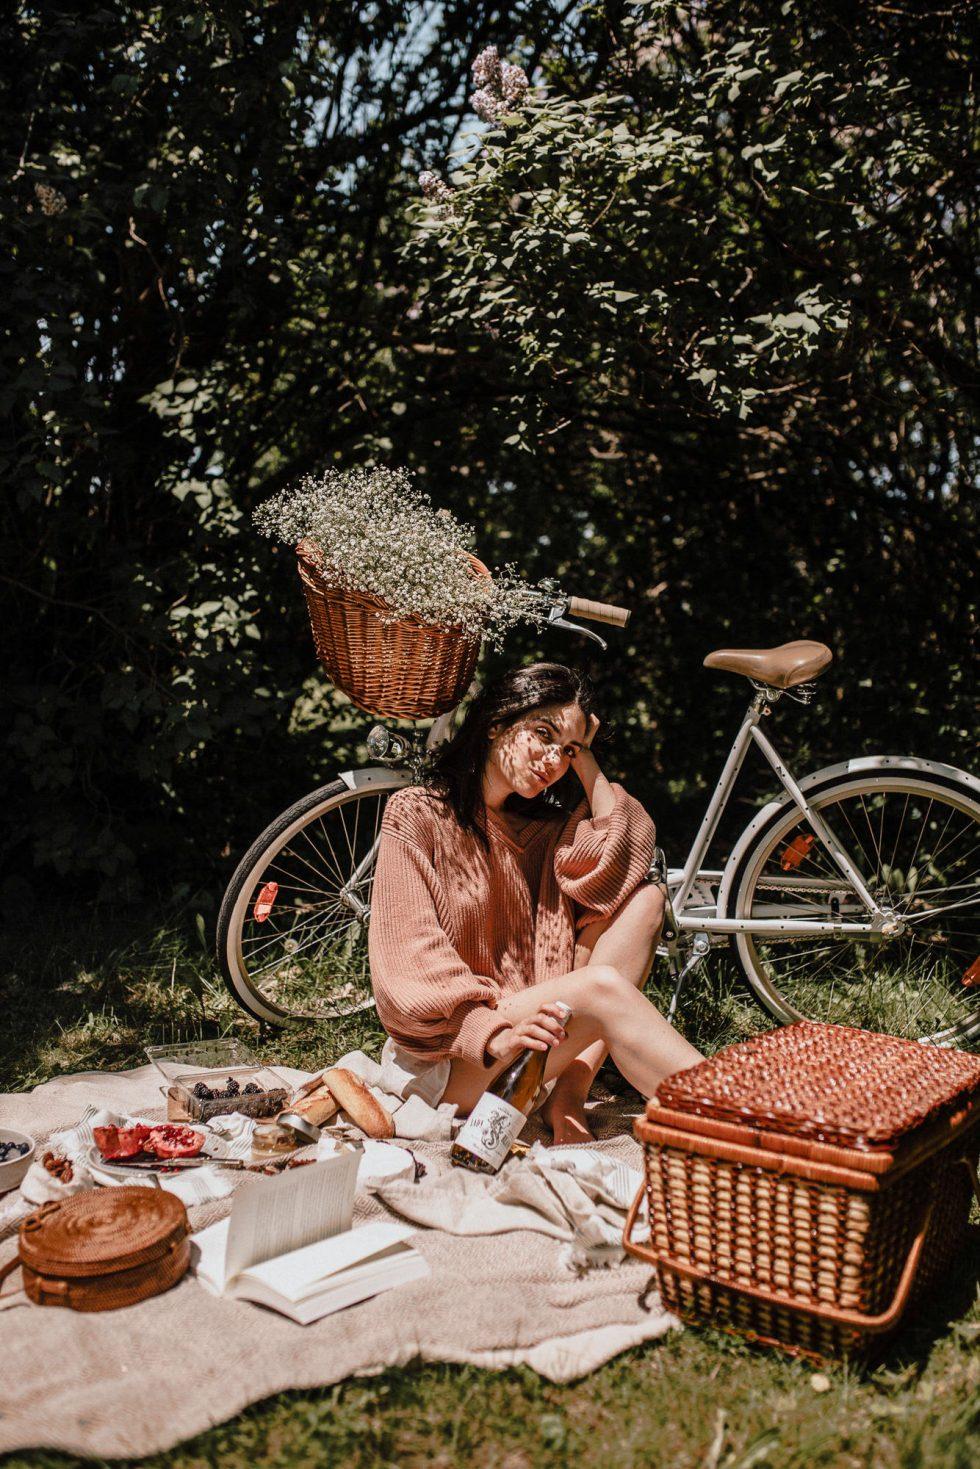 picnic-summer-montreal-lifestyle-photographer-laura-g-diaz